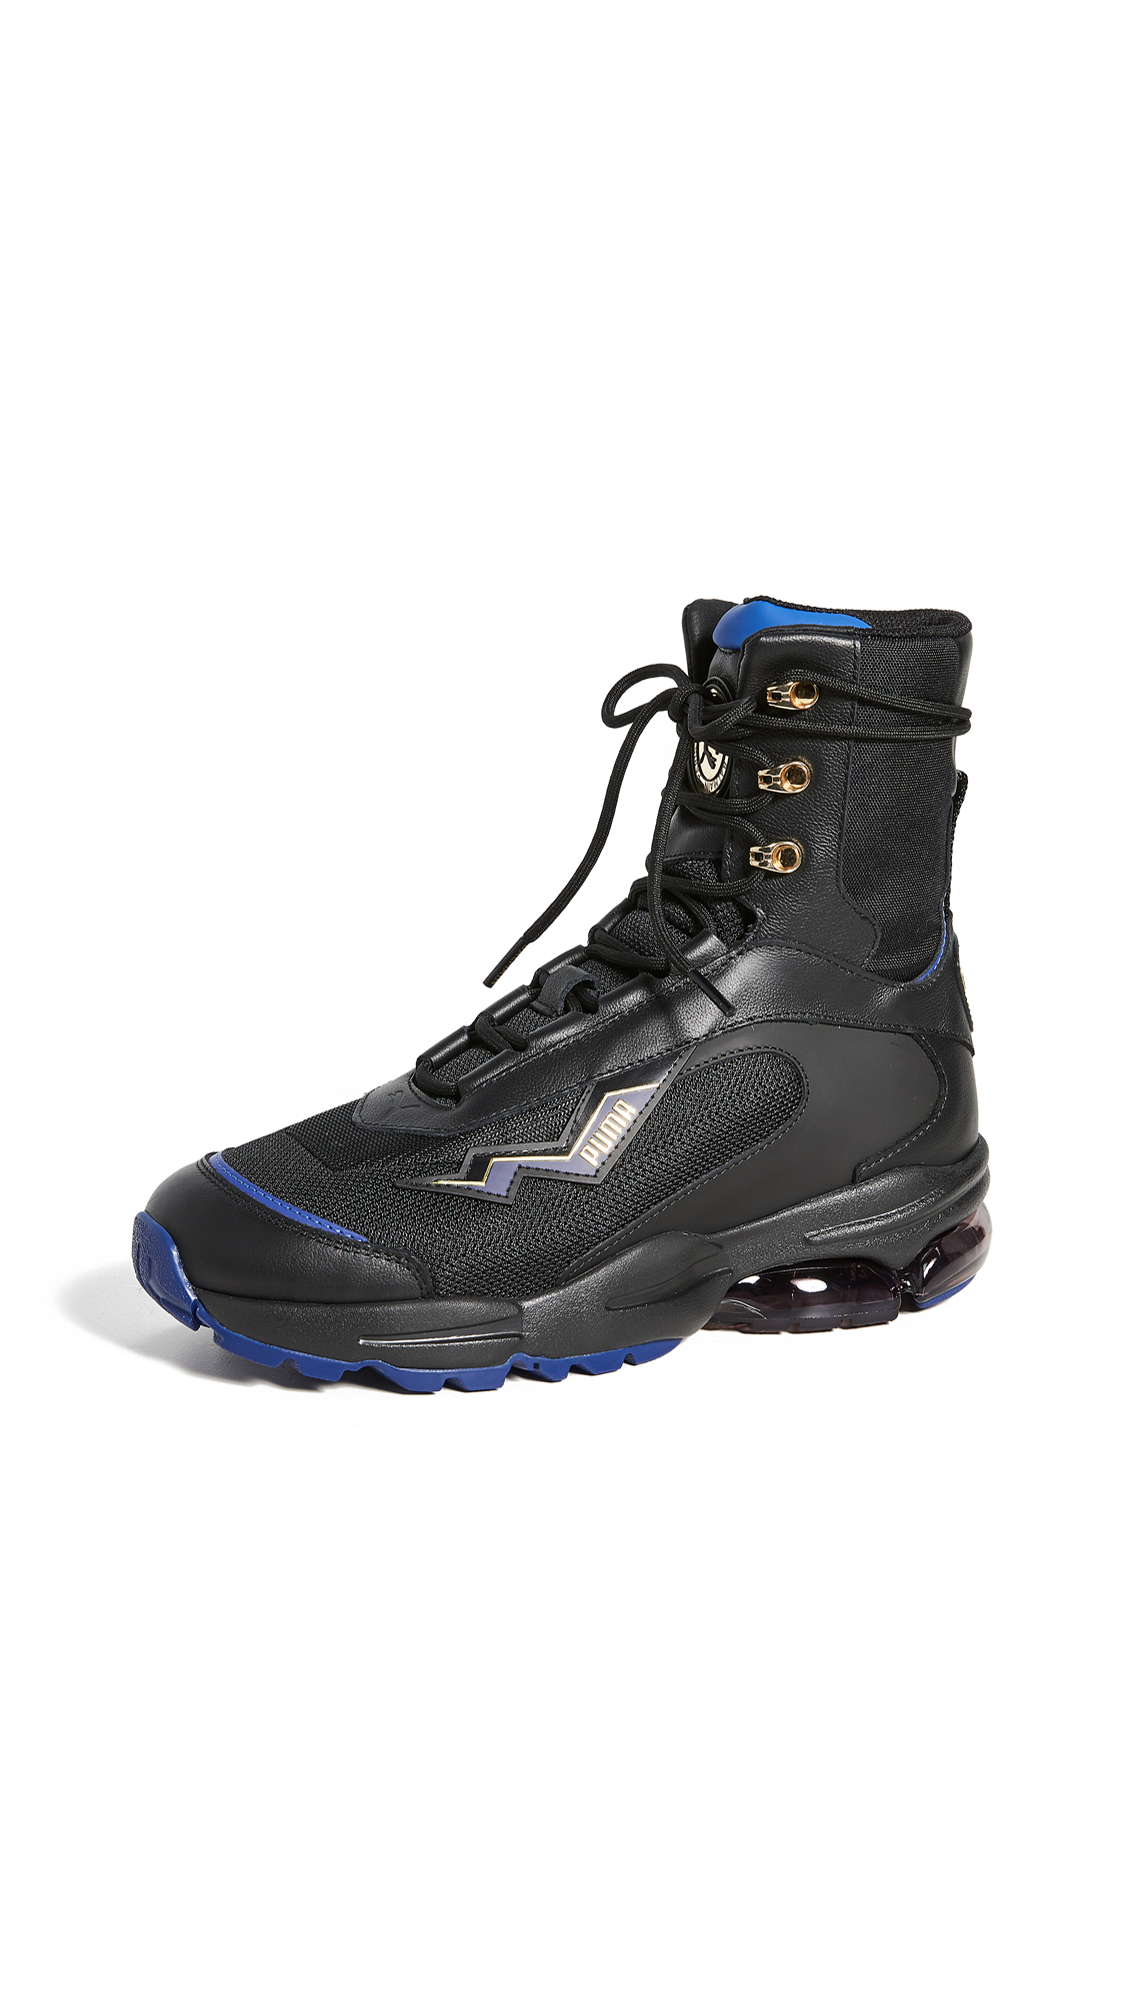 PUMA x Balmain Cell Stellar Mid Sneakers - 40% Off Sale